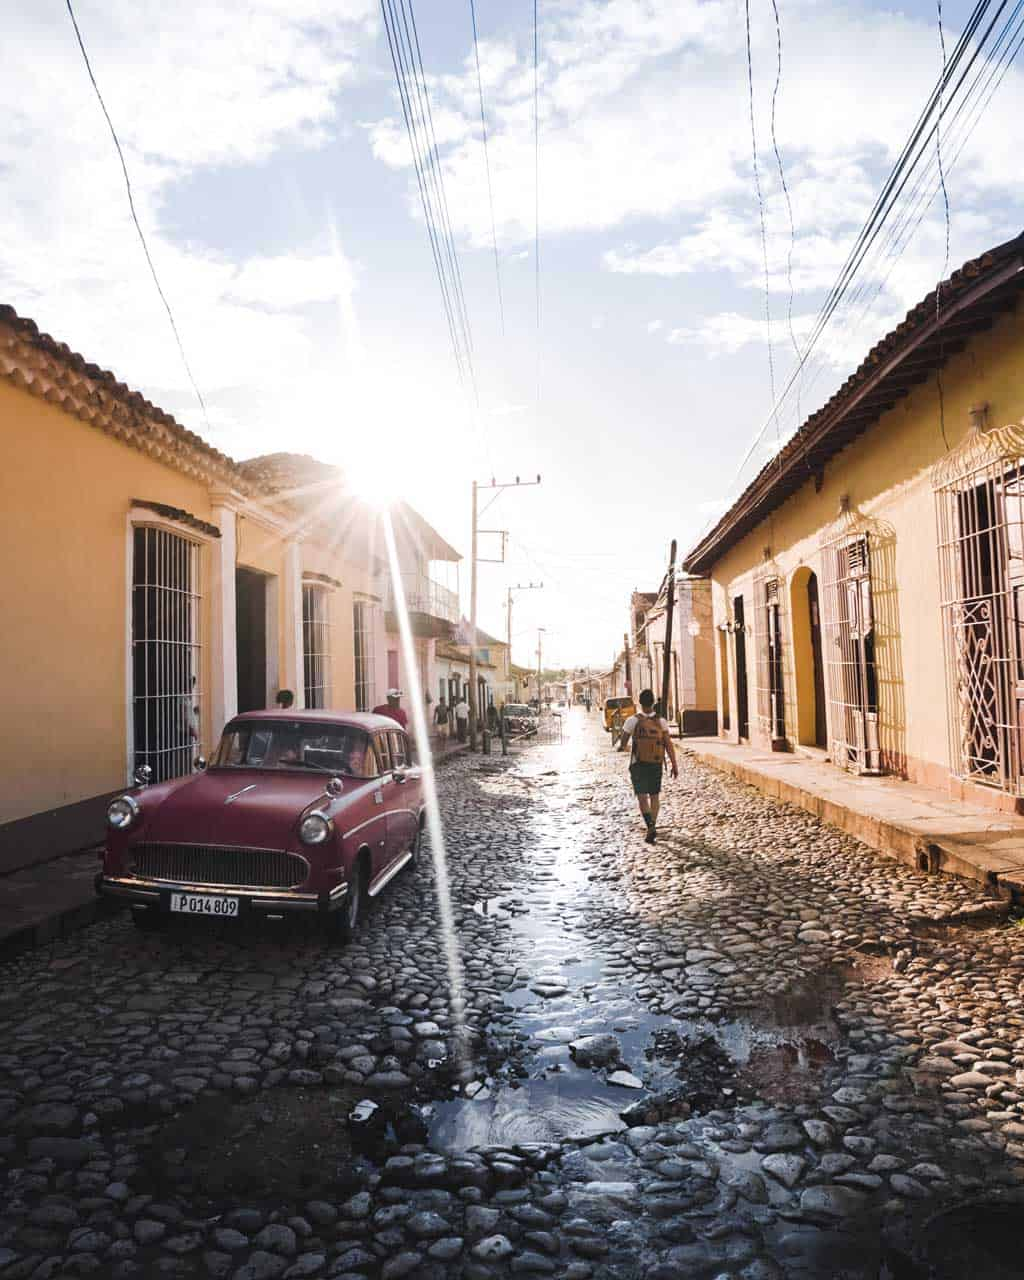 trinidad rue pavee cuba autrement 1